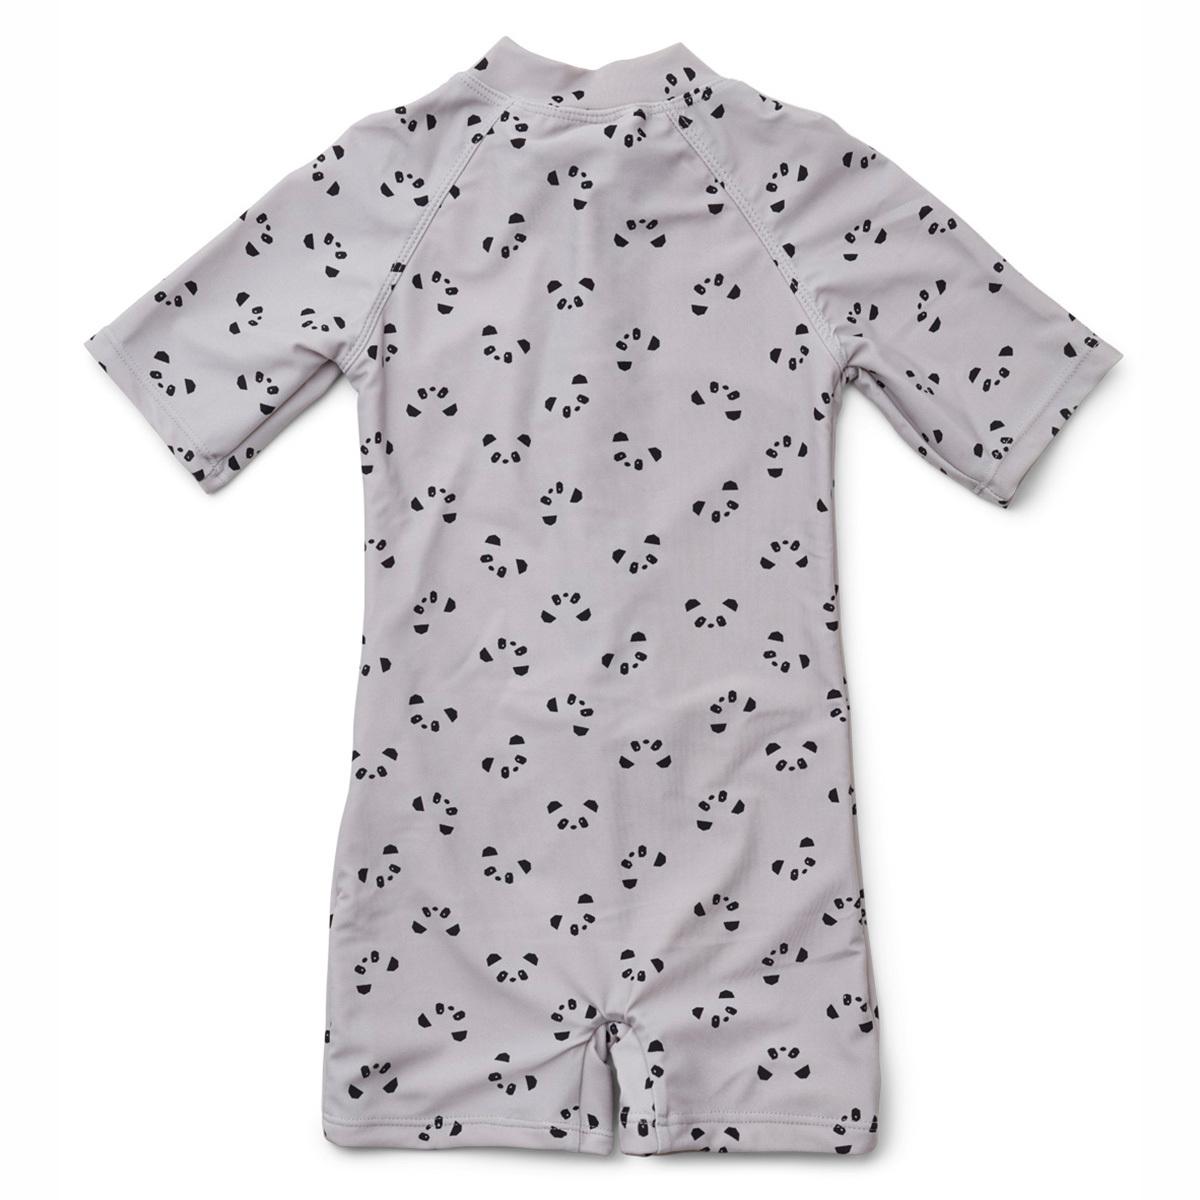 Accessoires bébé Combishort de Bain Max - Panda Dumbo Grey - 2/3 Ans Combishort de Bain Max - Panda Dumbo Grey - 2/3 Ans